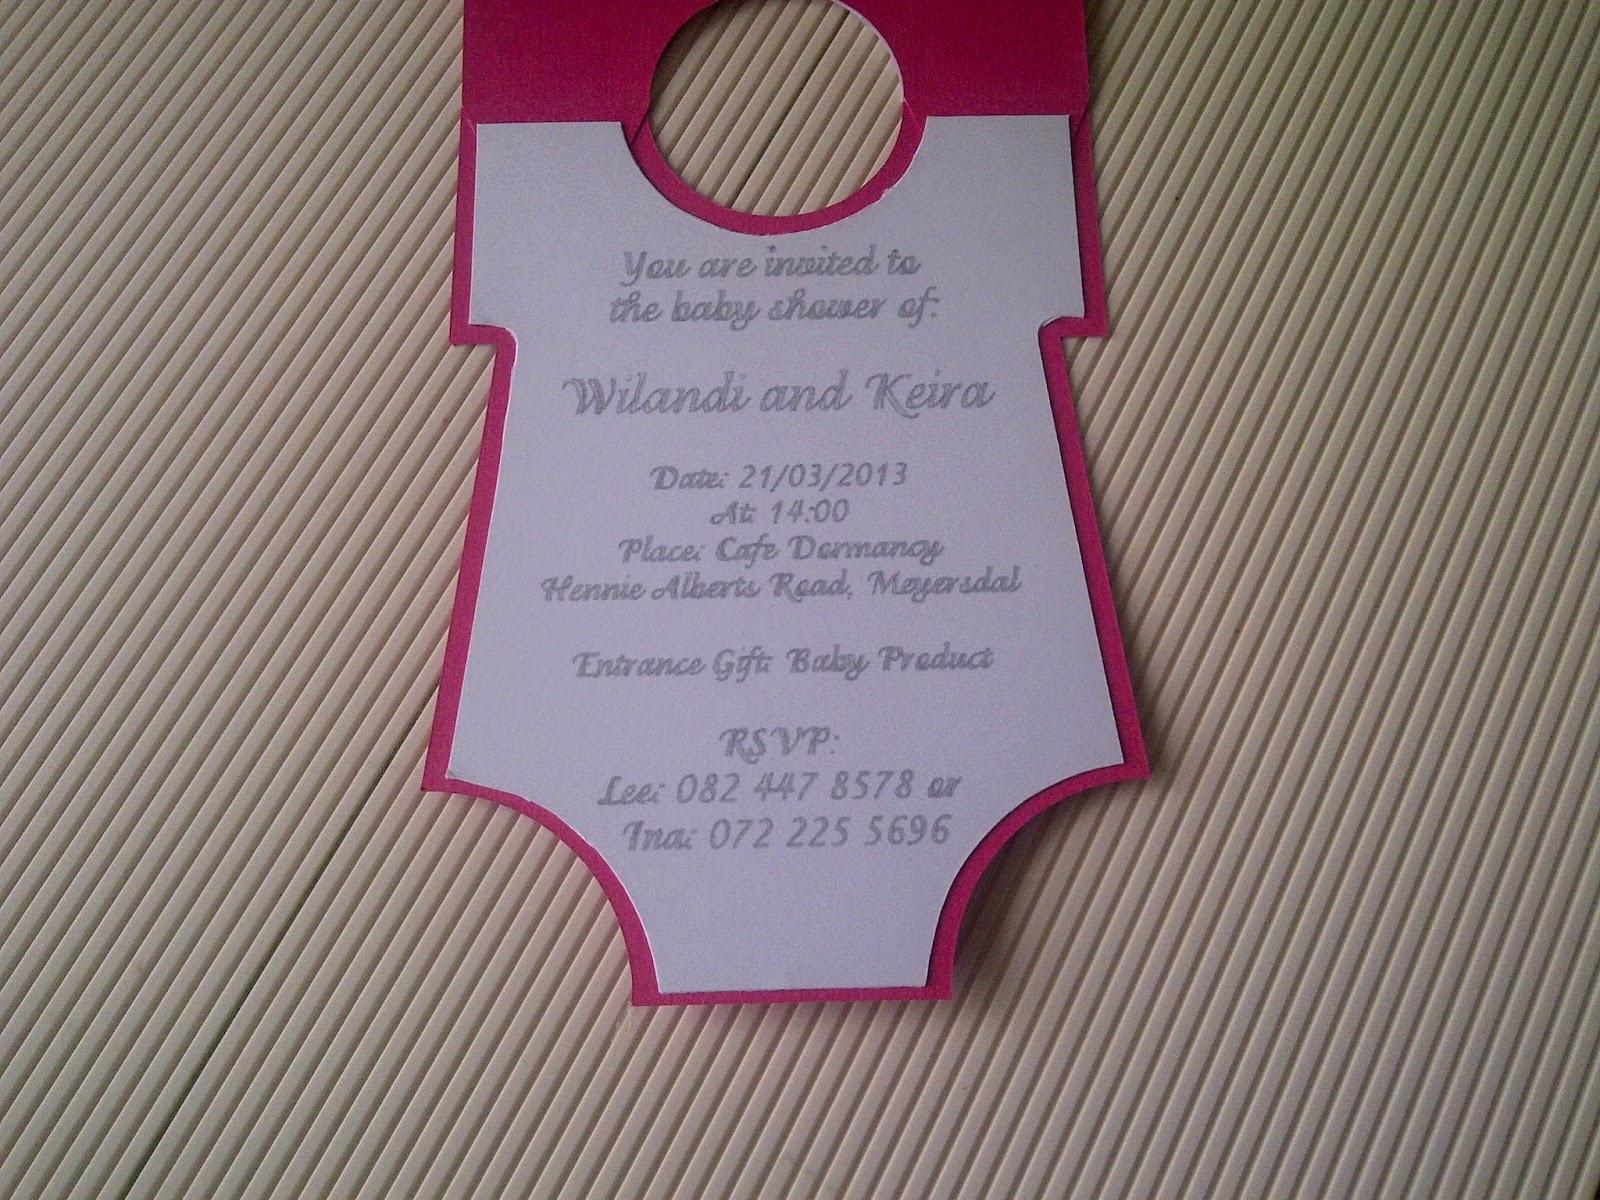 Free Onesie Invitation Template Elegant Best S Of Esie Template for Baby Shower Invitation